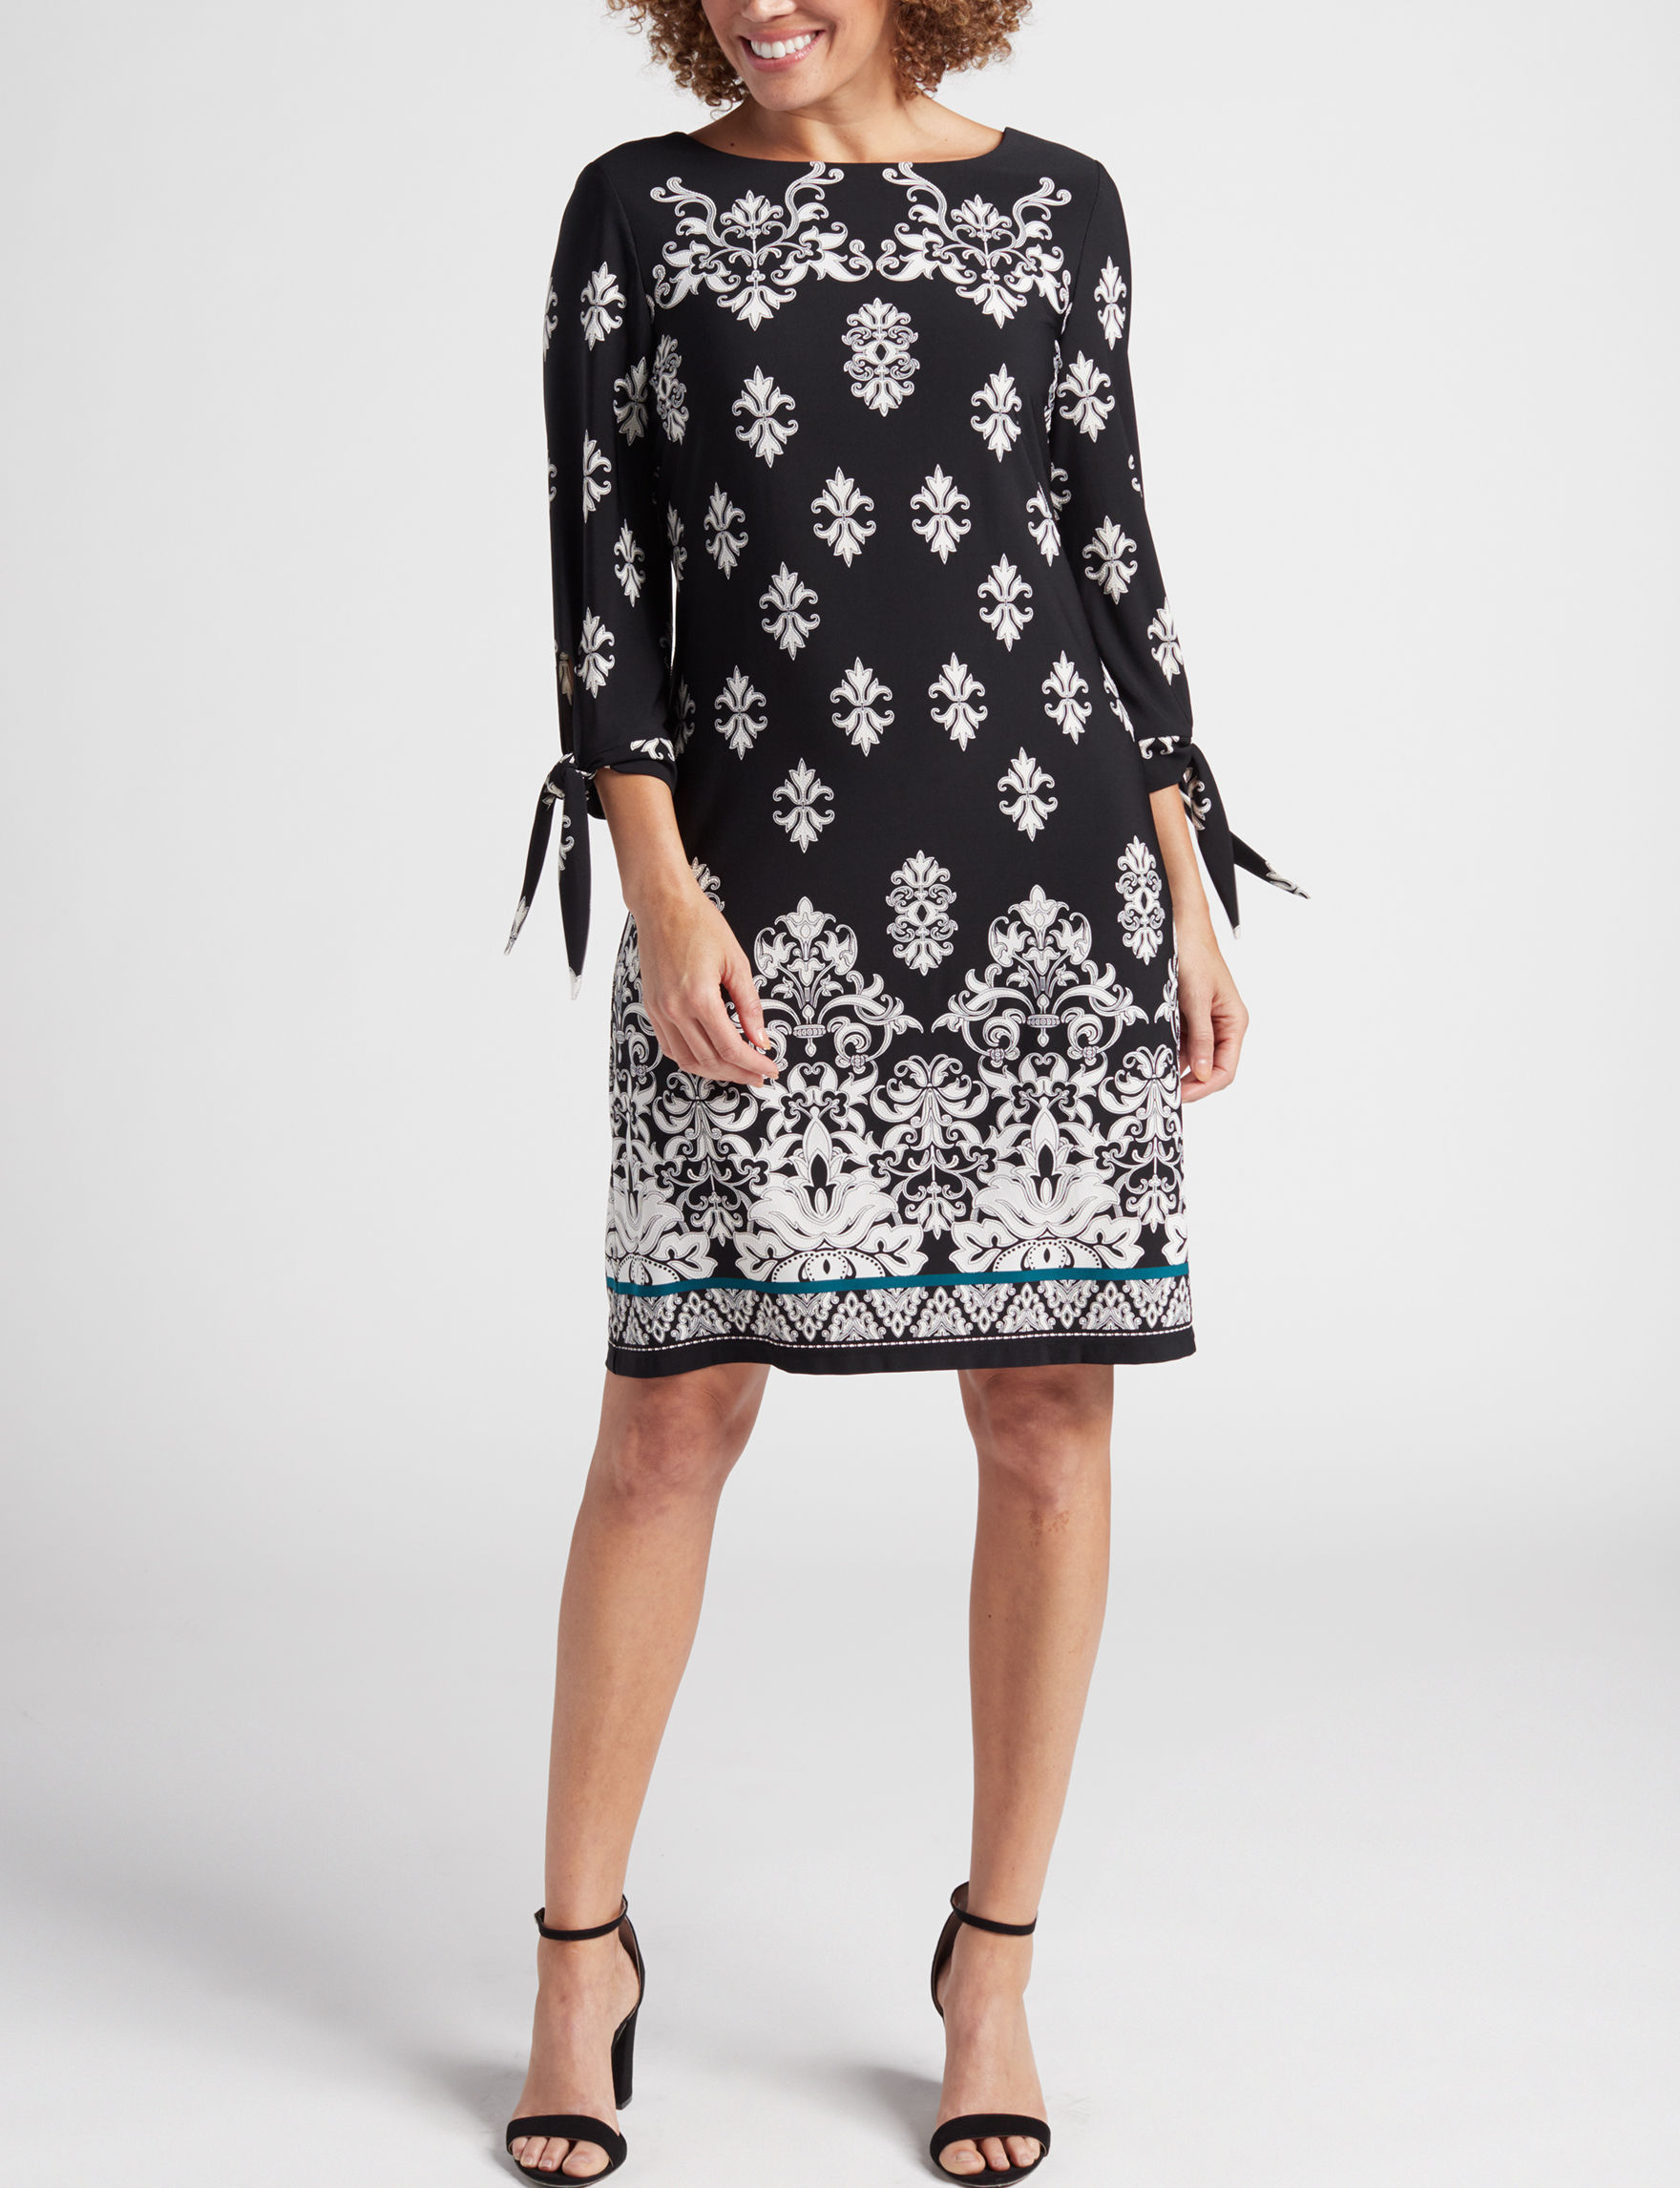 Sandra Darren Black / Ivory Everyday & Casual Sheath Dresses